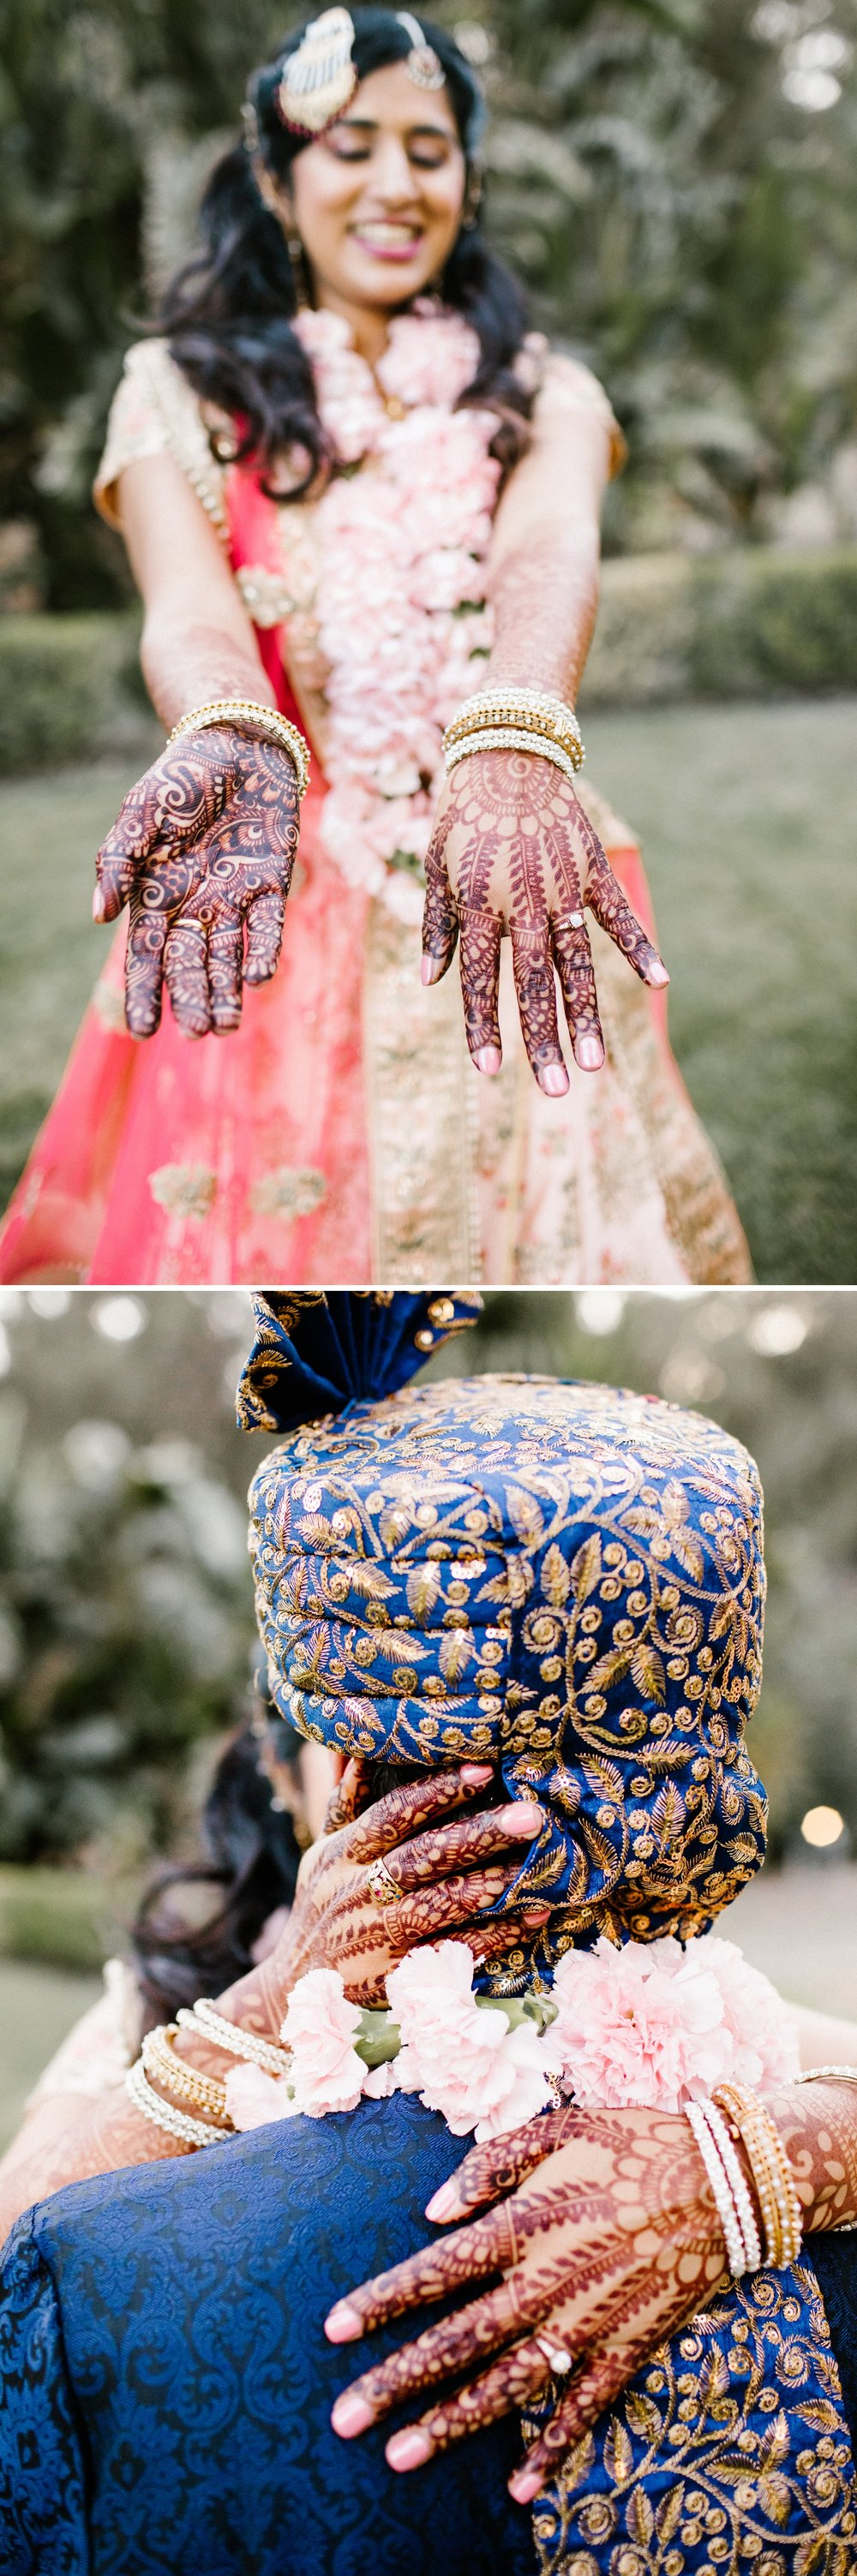 Newhall Mansion Wedding_0031.jpg